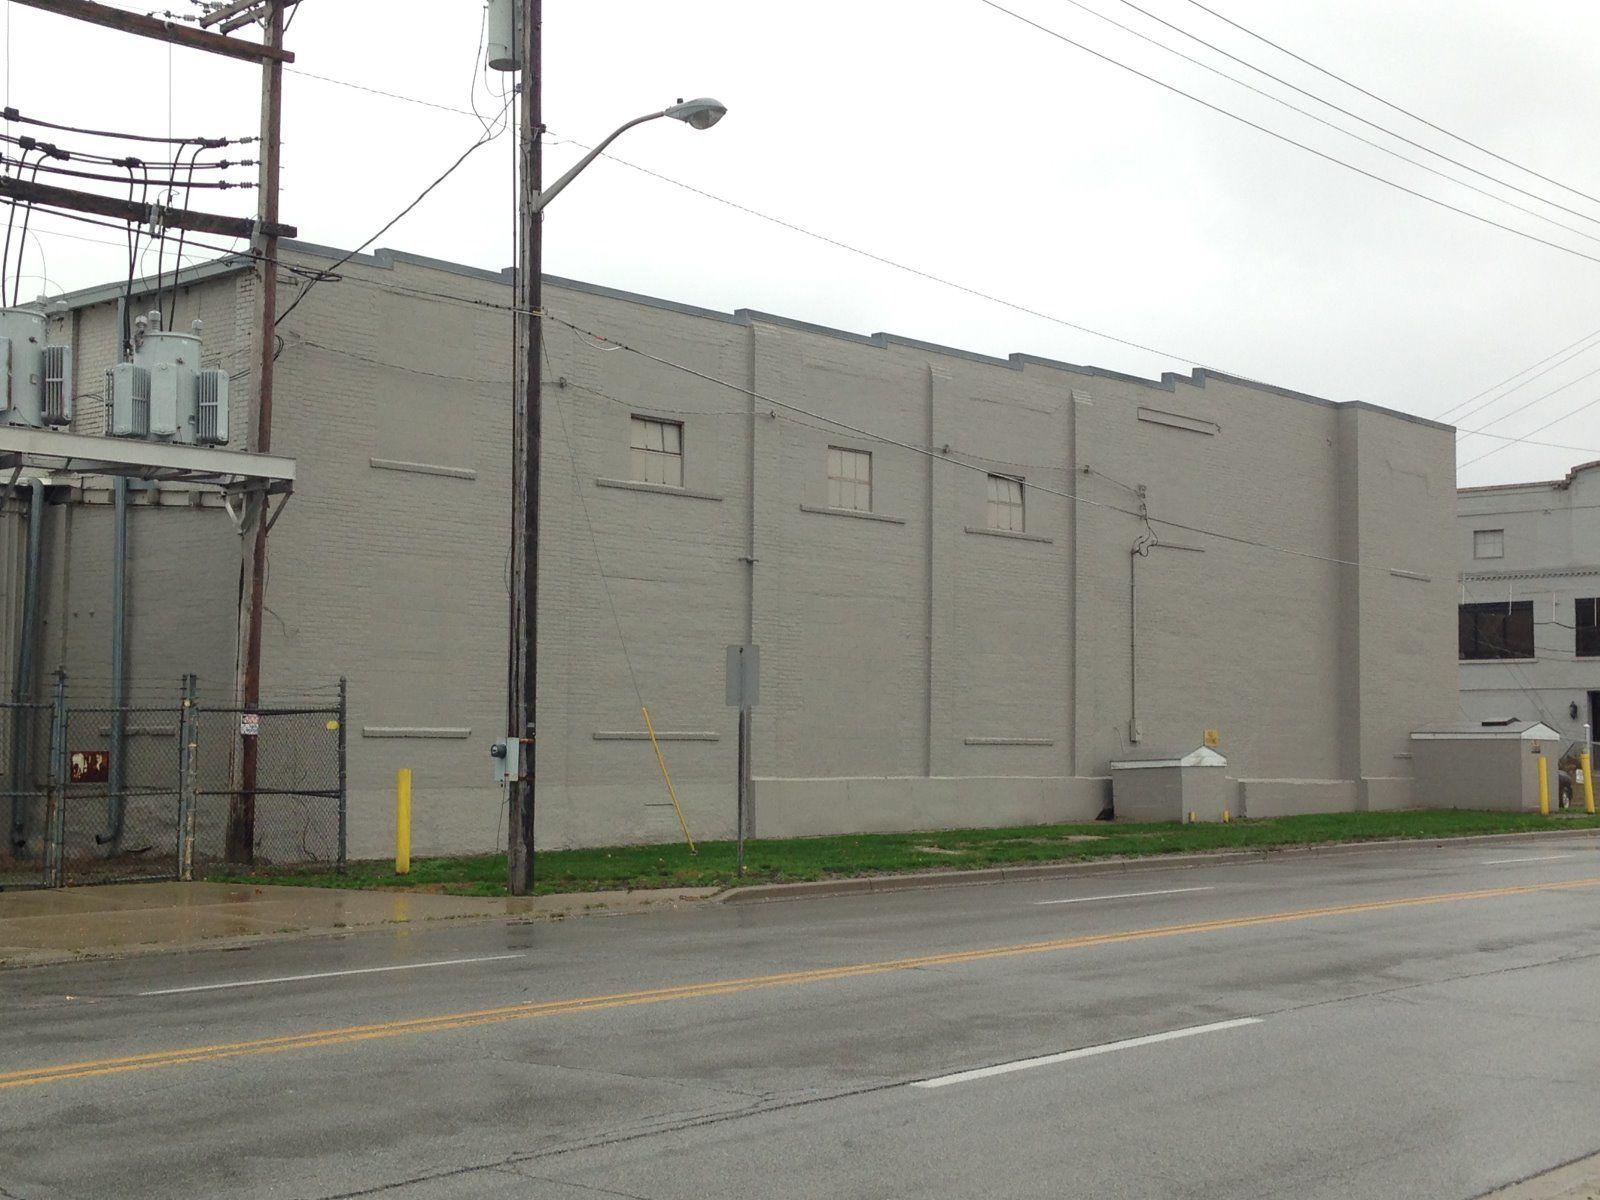 Syndicate Sales - Kokomo, IN - Masonry Restoration After - Wash, Tuckpoint, Caulk, Elastomeric Paint